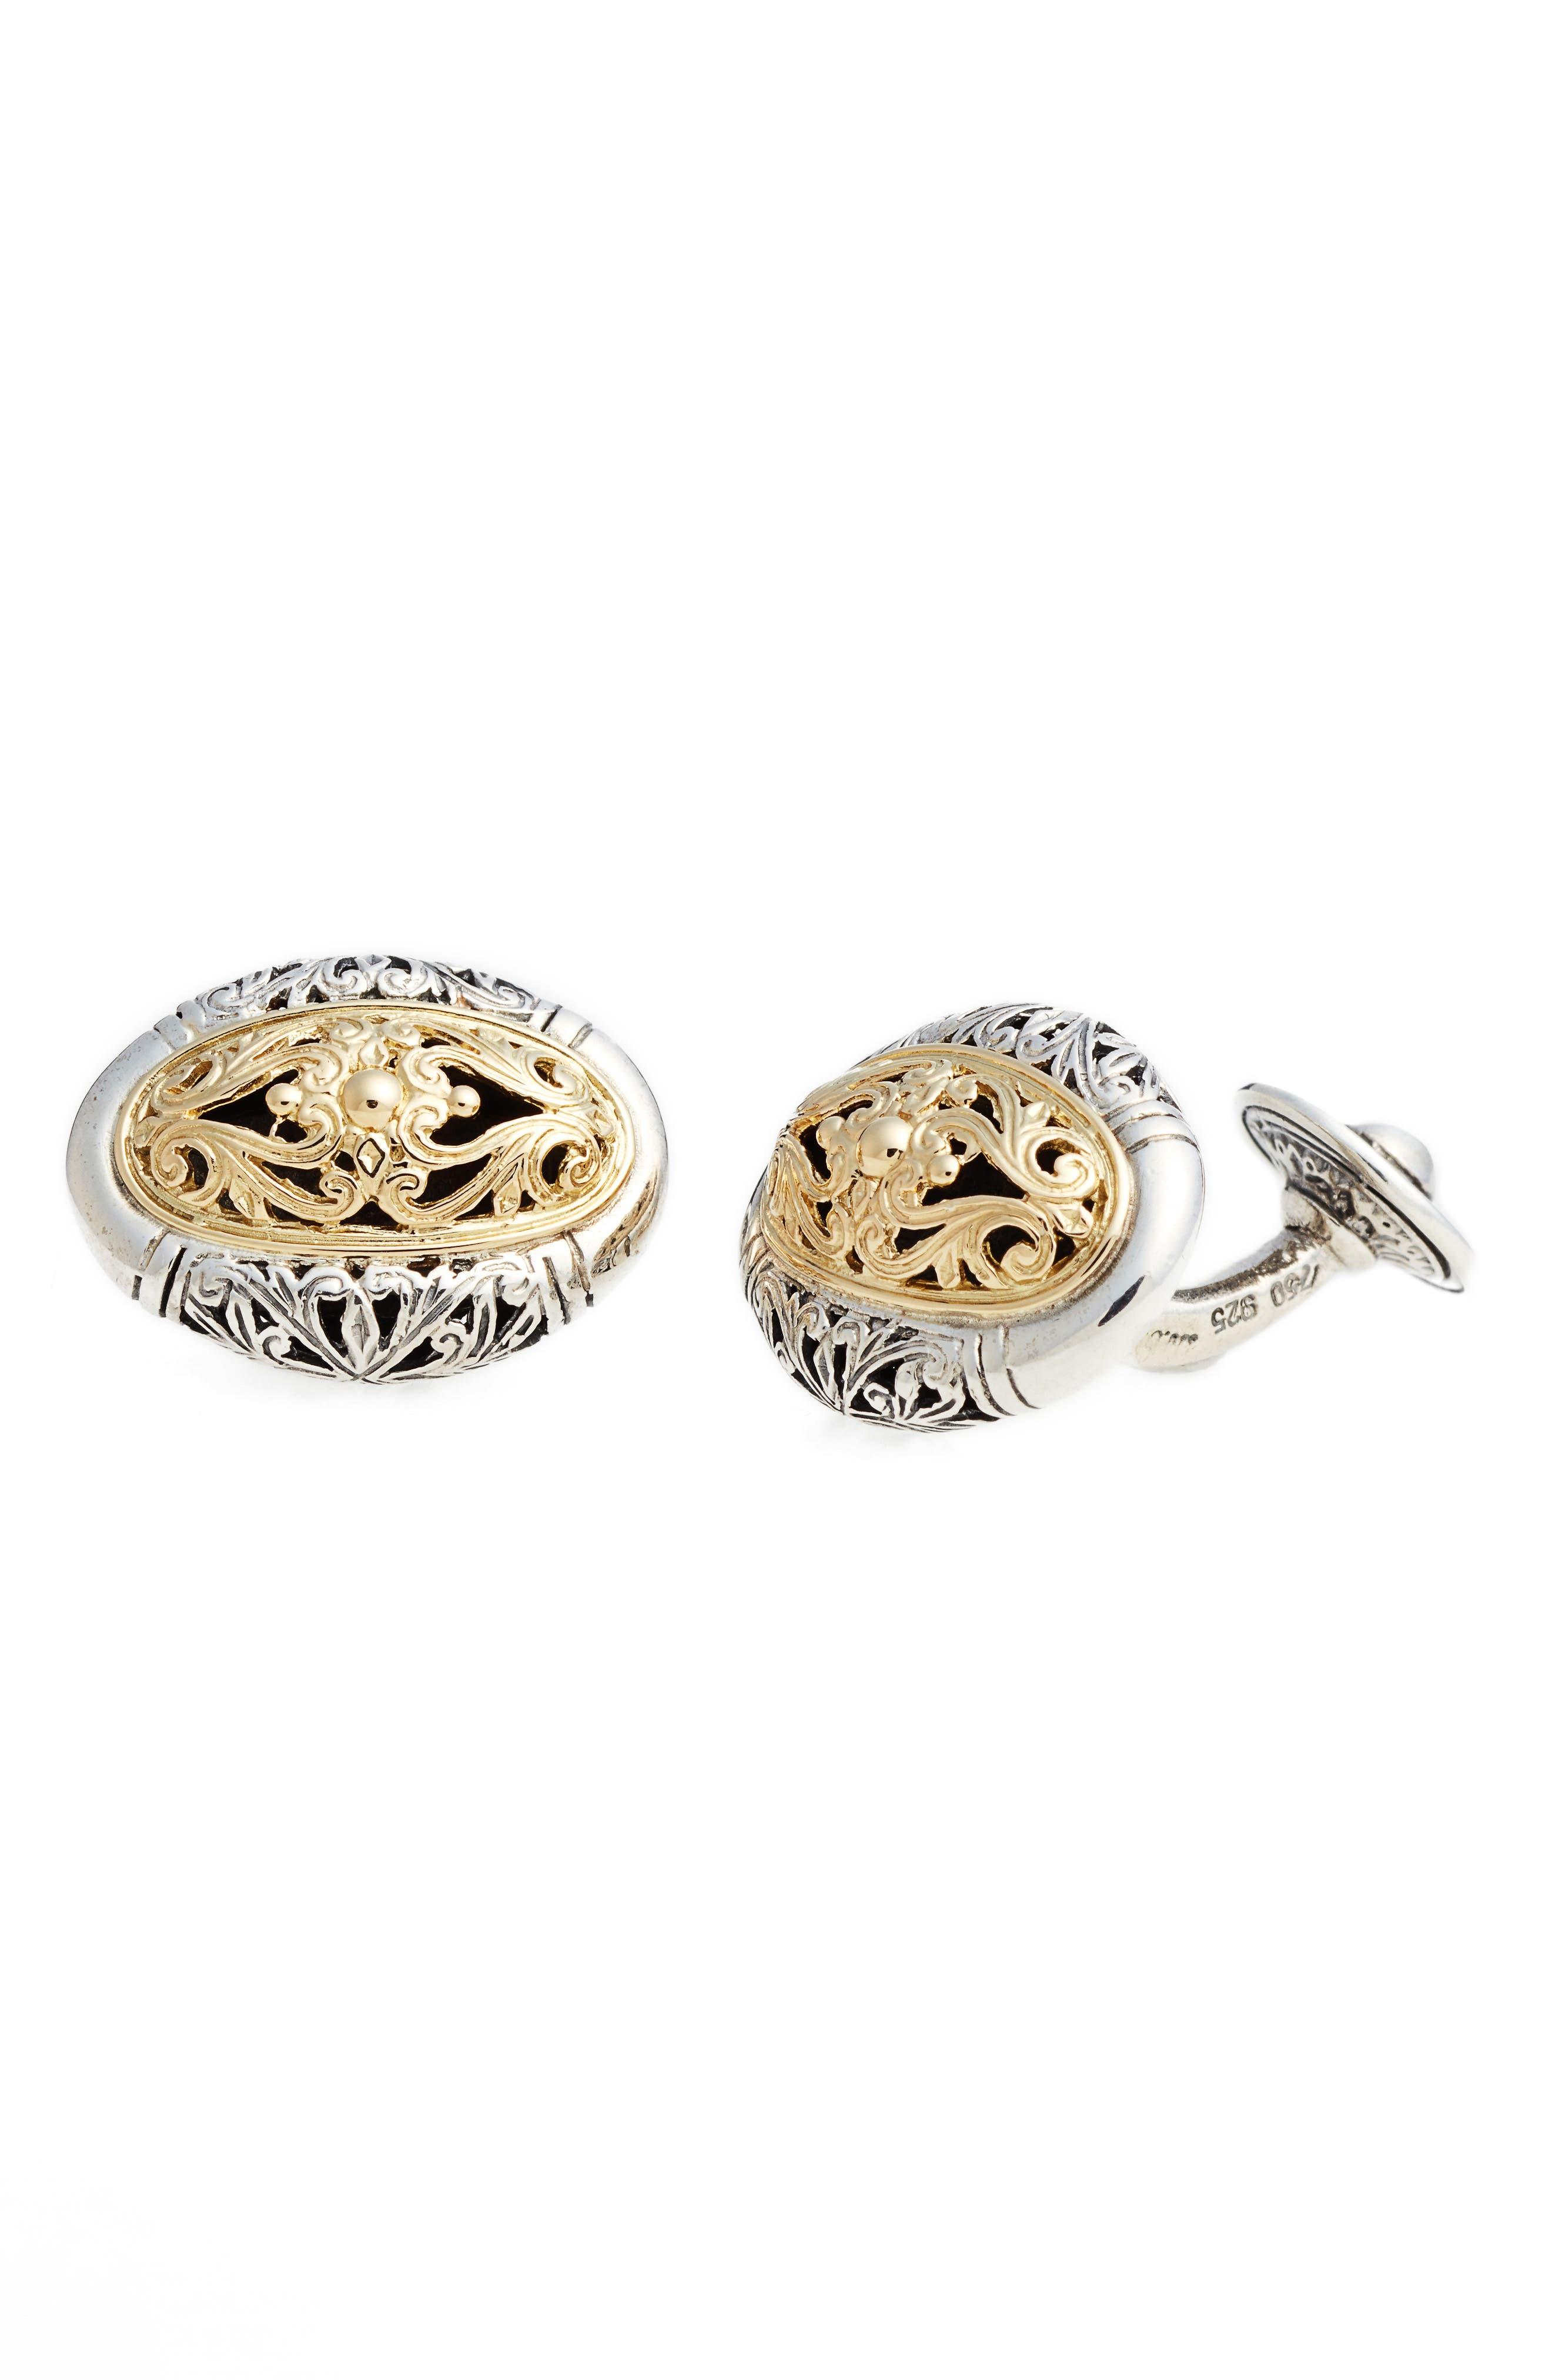 Main Image - Konstantino Classics Oval Cuff Links